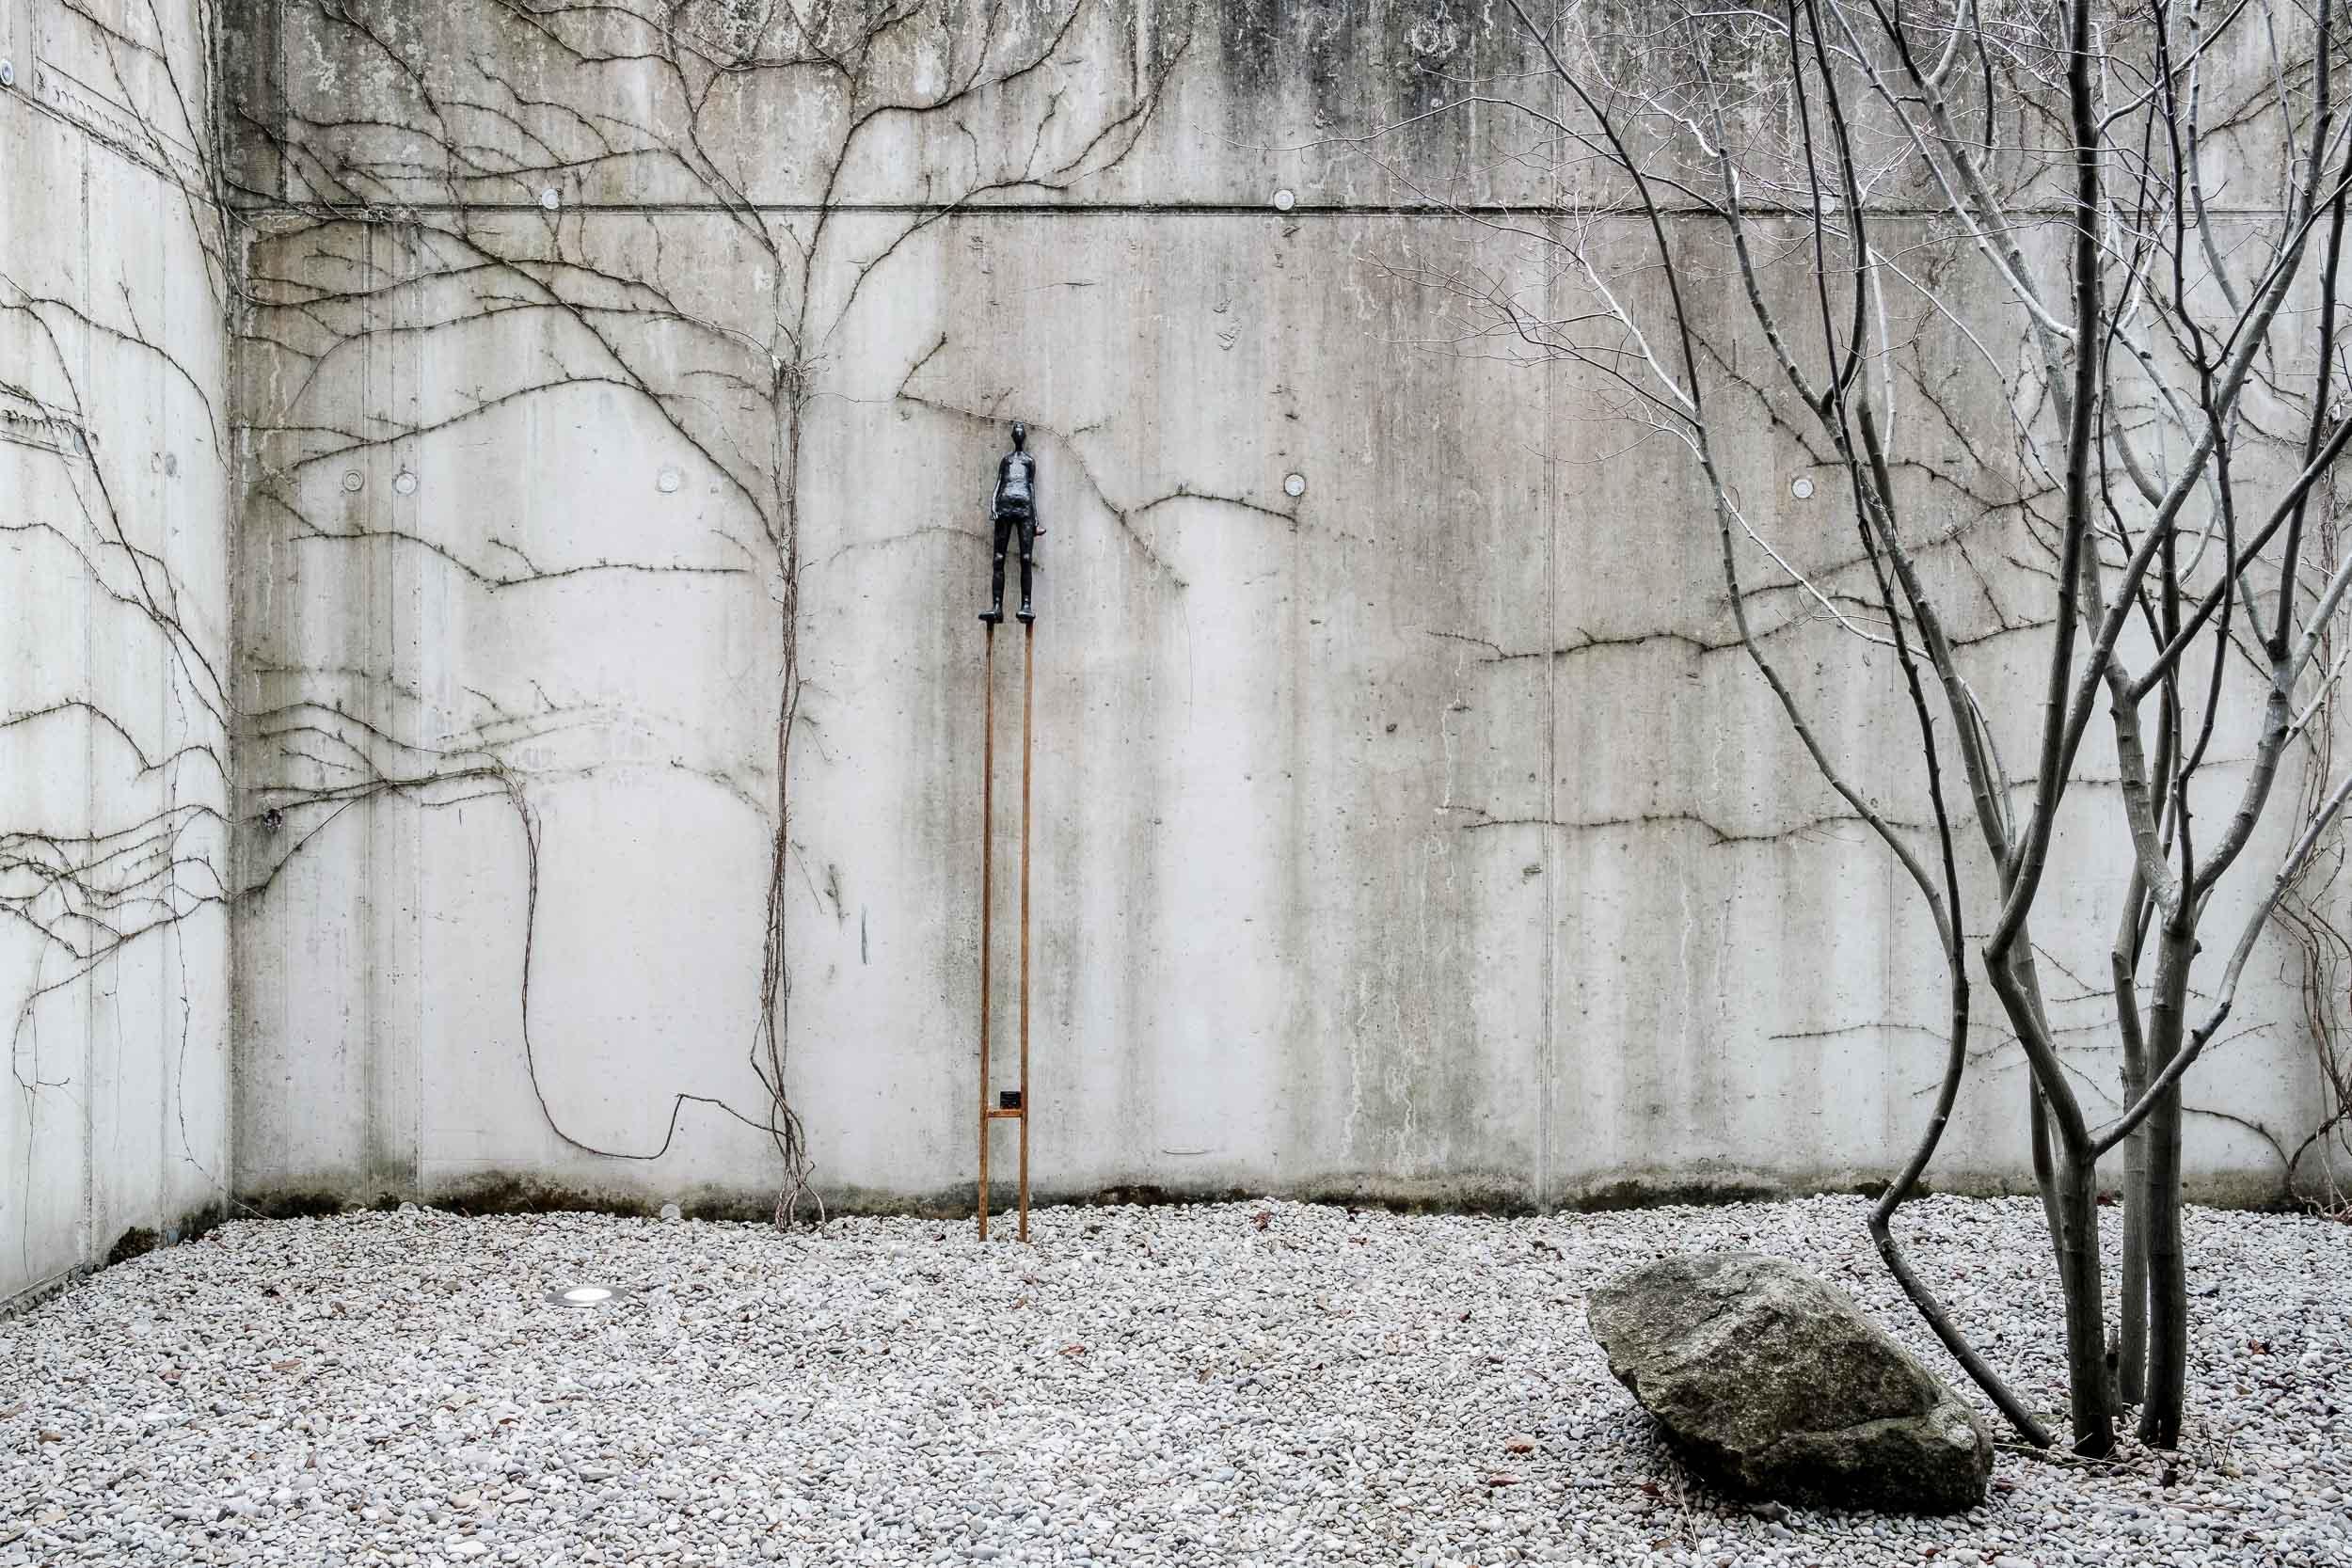 2017-03-14_Domo-Büro_036.jpg